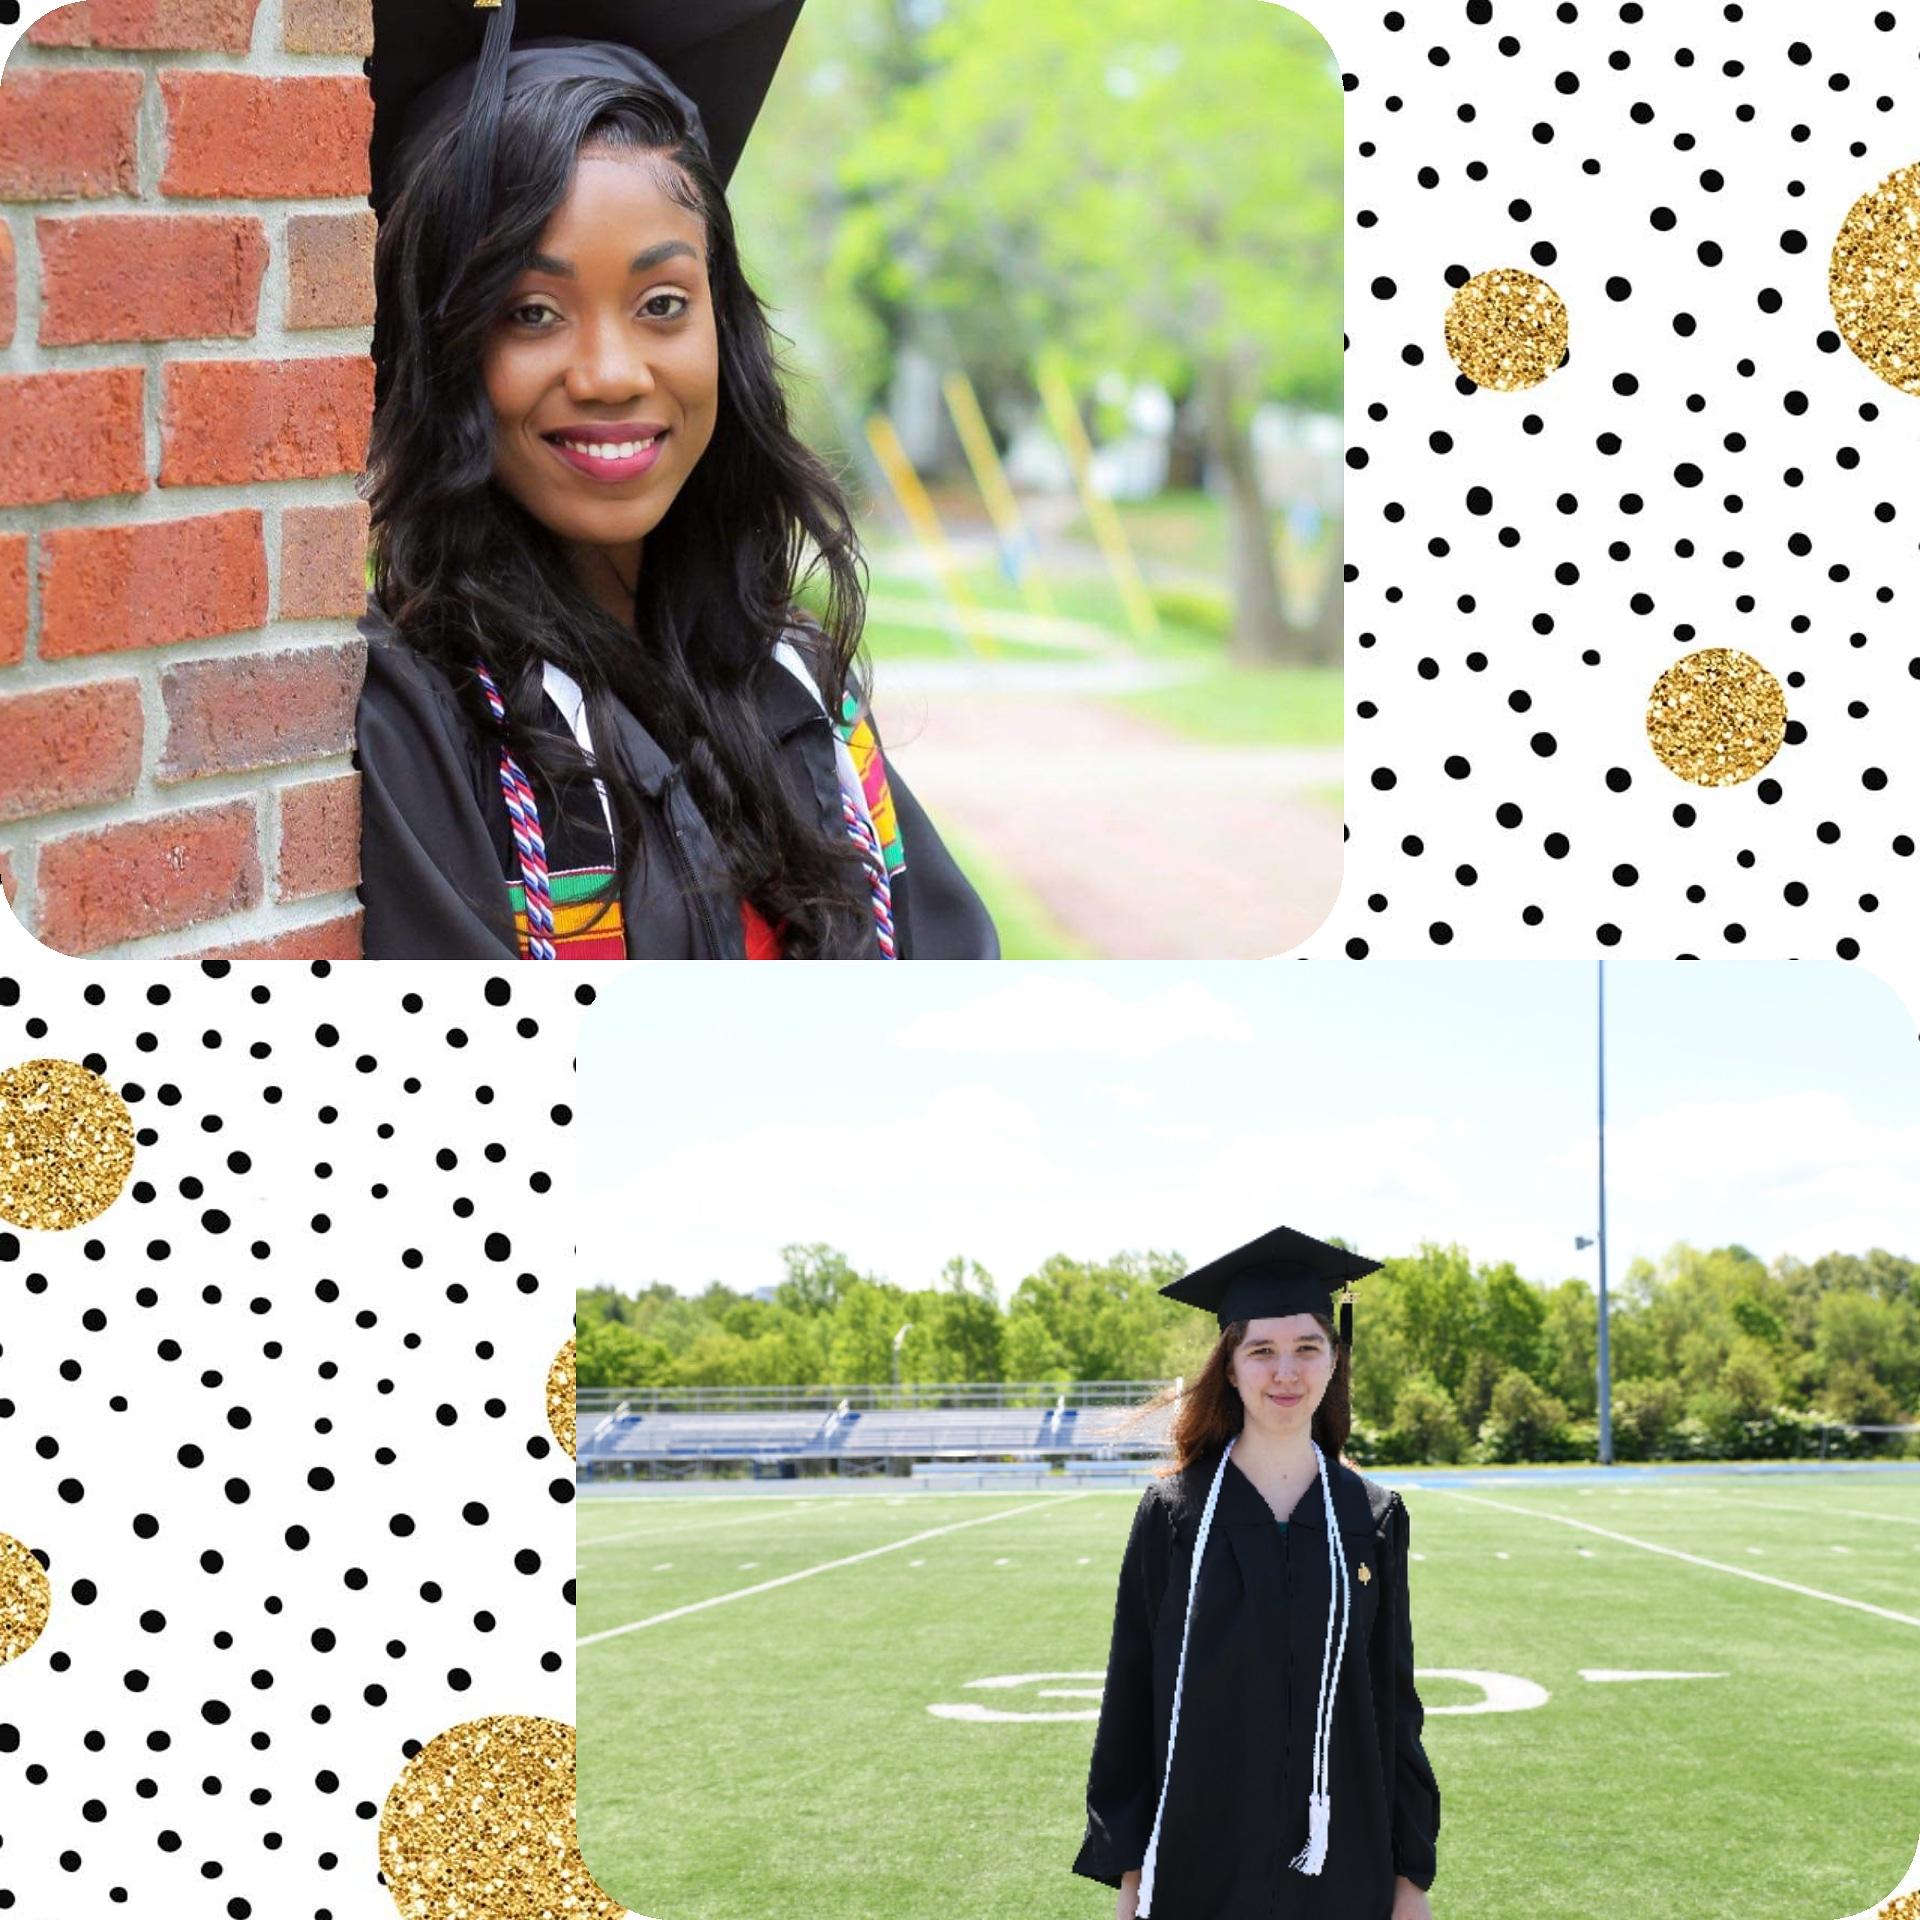 Congrats to our 2021 graduated seniors Jaccine Jeador and Katie Perkins!